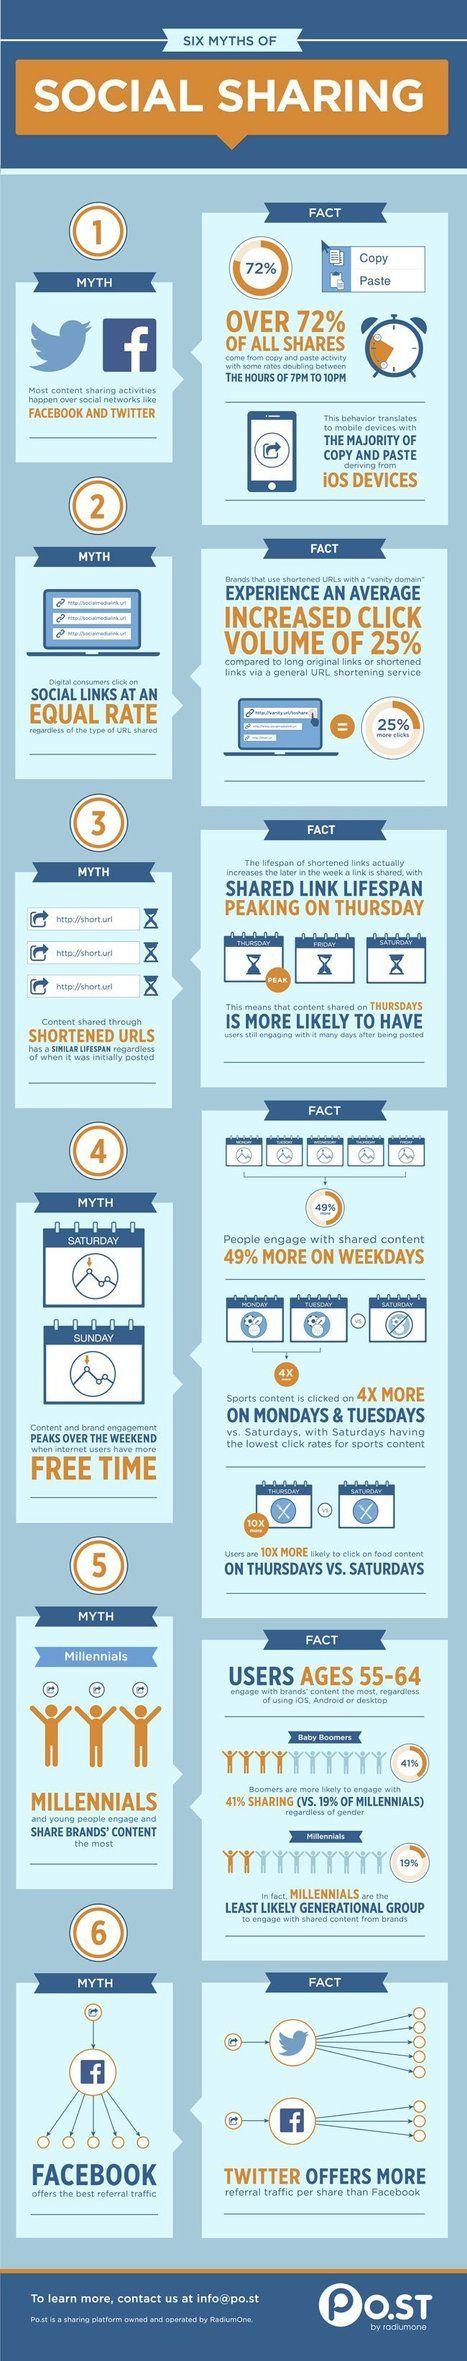 6 Myths of Social Sharing (infographic) | visualizing #socialmediatips